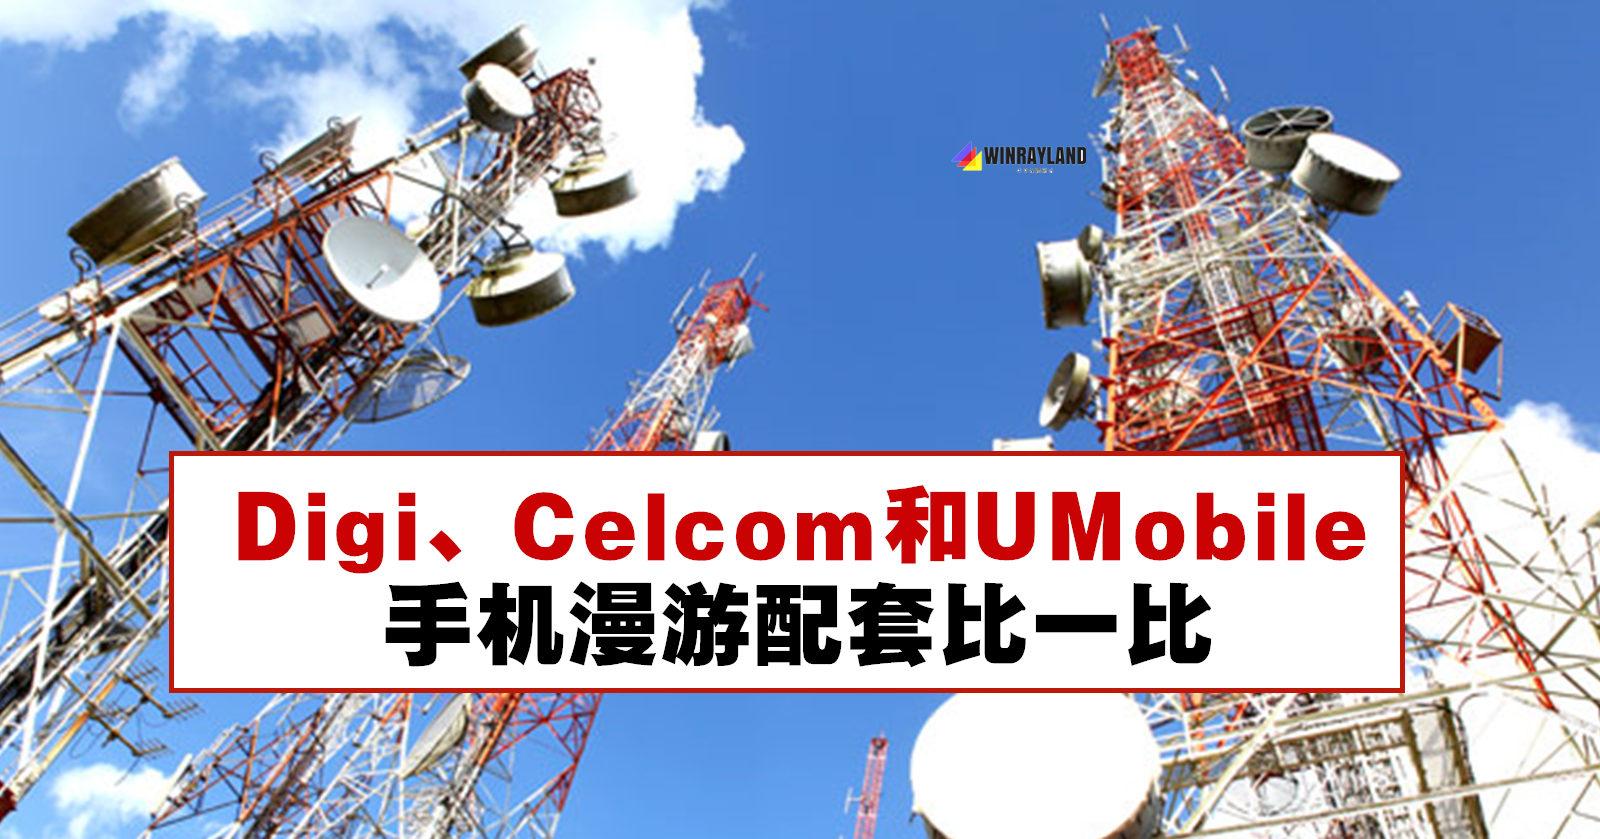 Digi、Celcom和UMobile漫游配套比一比